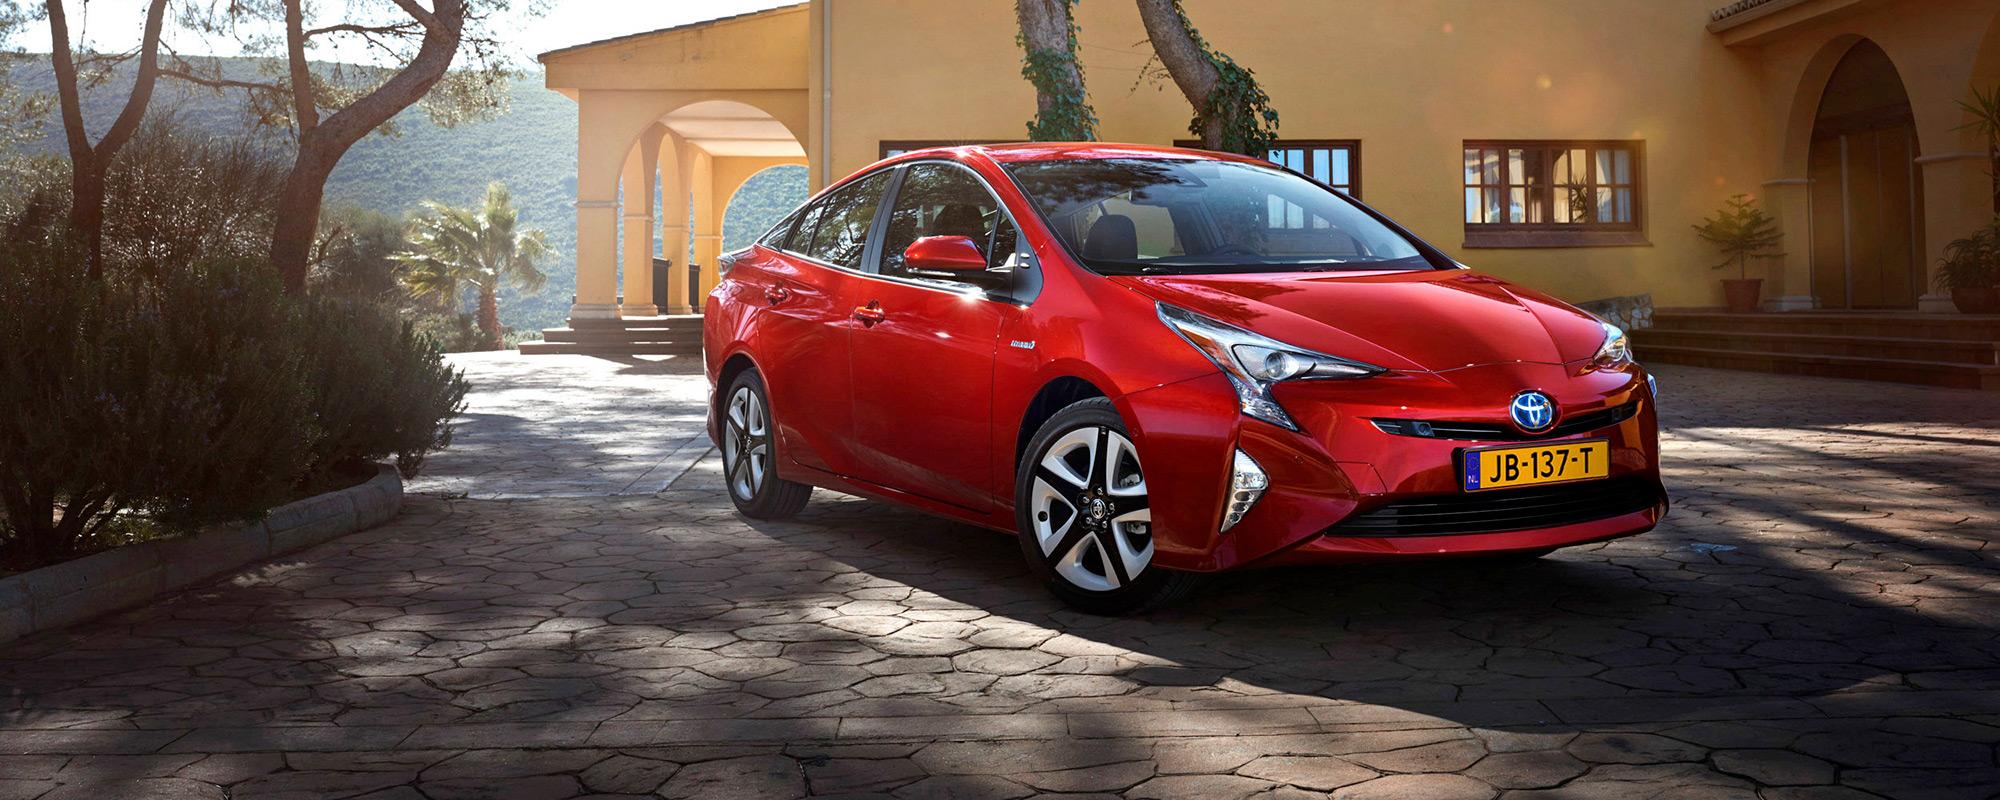 Toyota Hybrids (zonder stekker) verslaan Tesla in nieuwe ADAC EcoTest